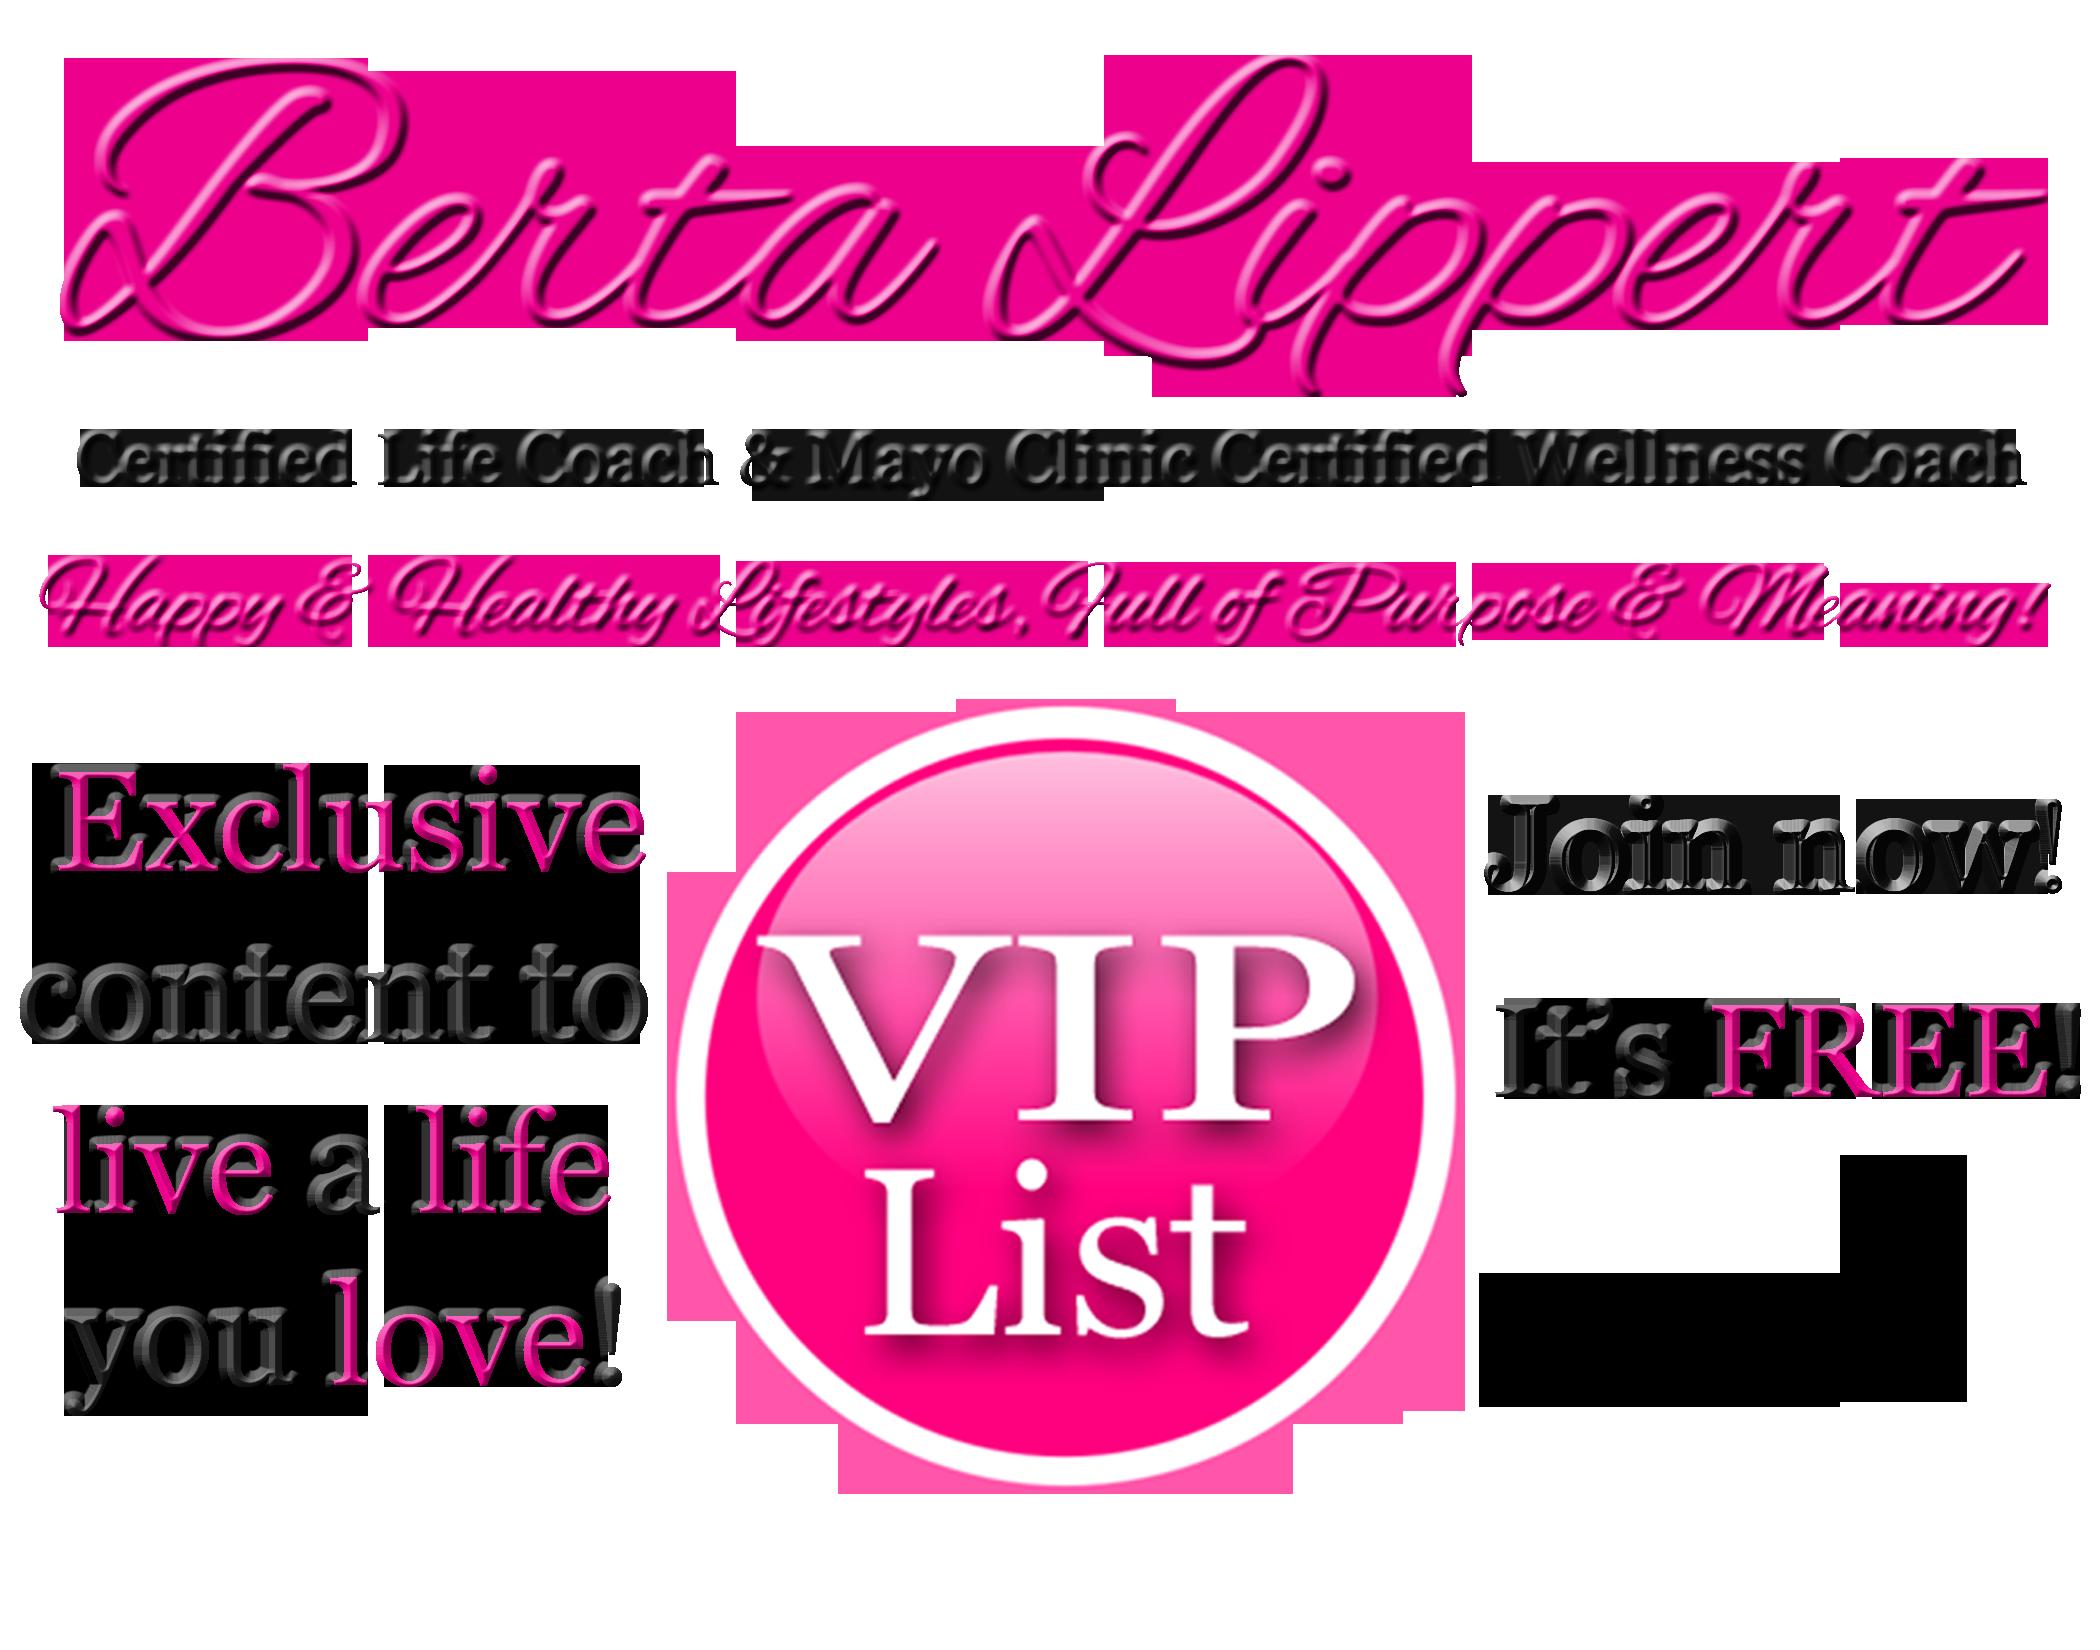 Berta Lippert Certified Life Coach Amp Mayo Clinic